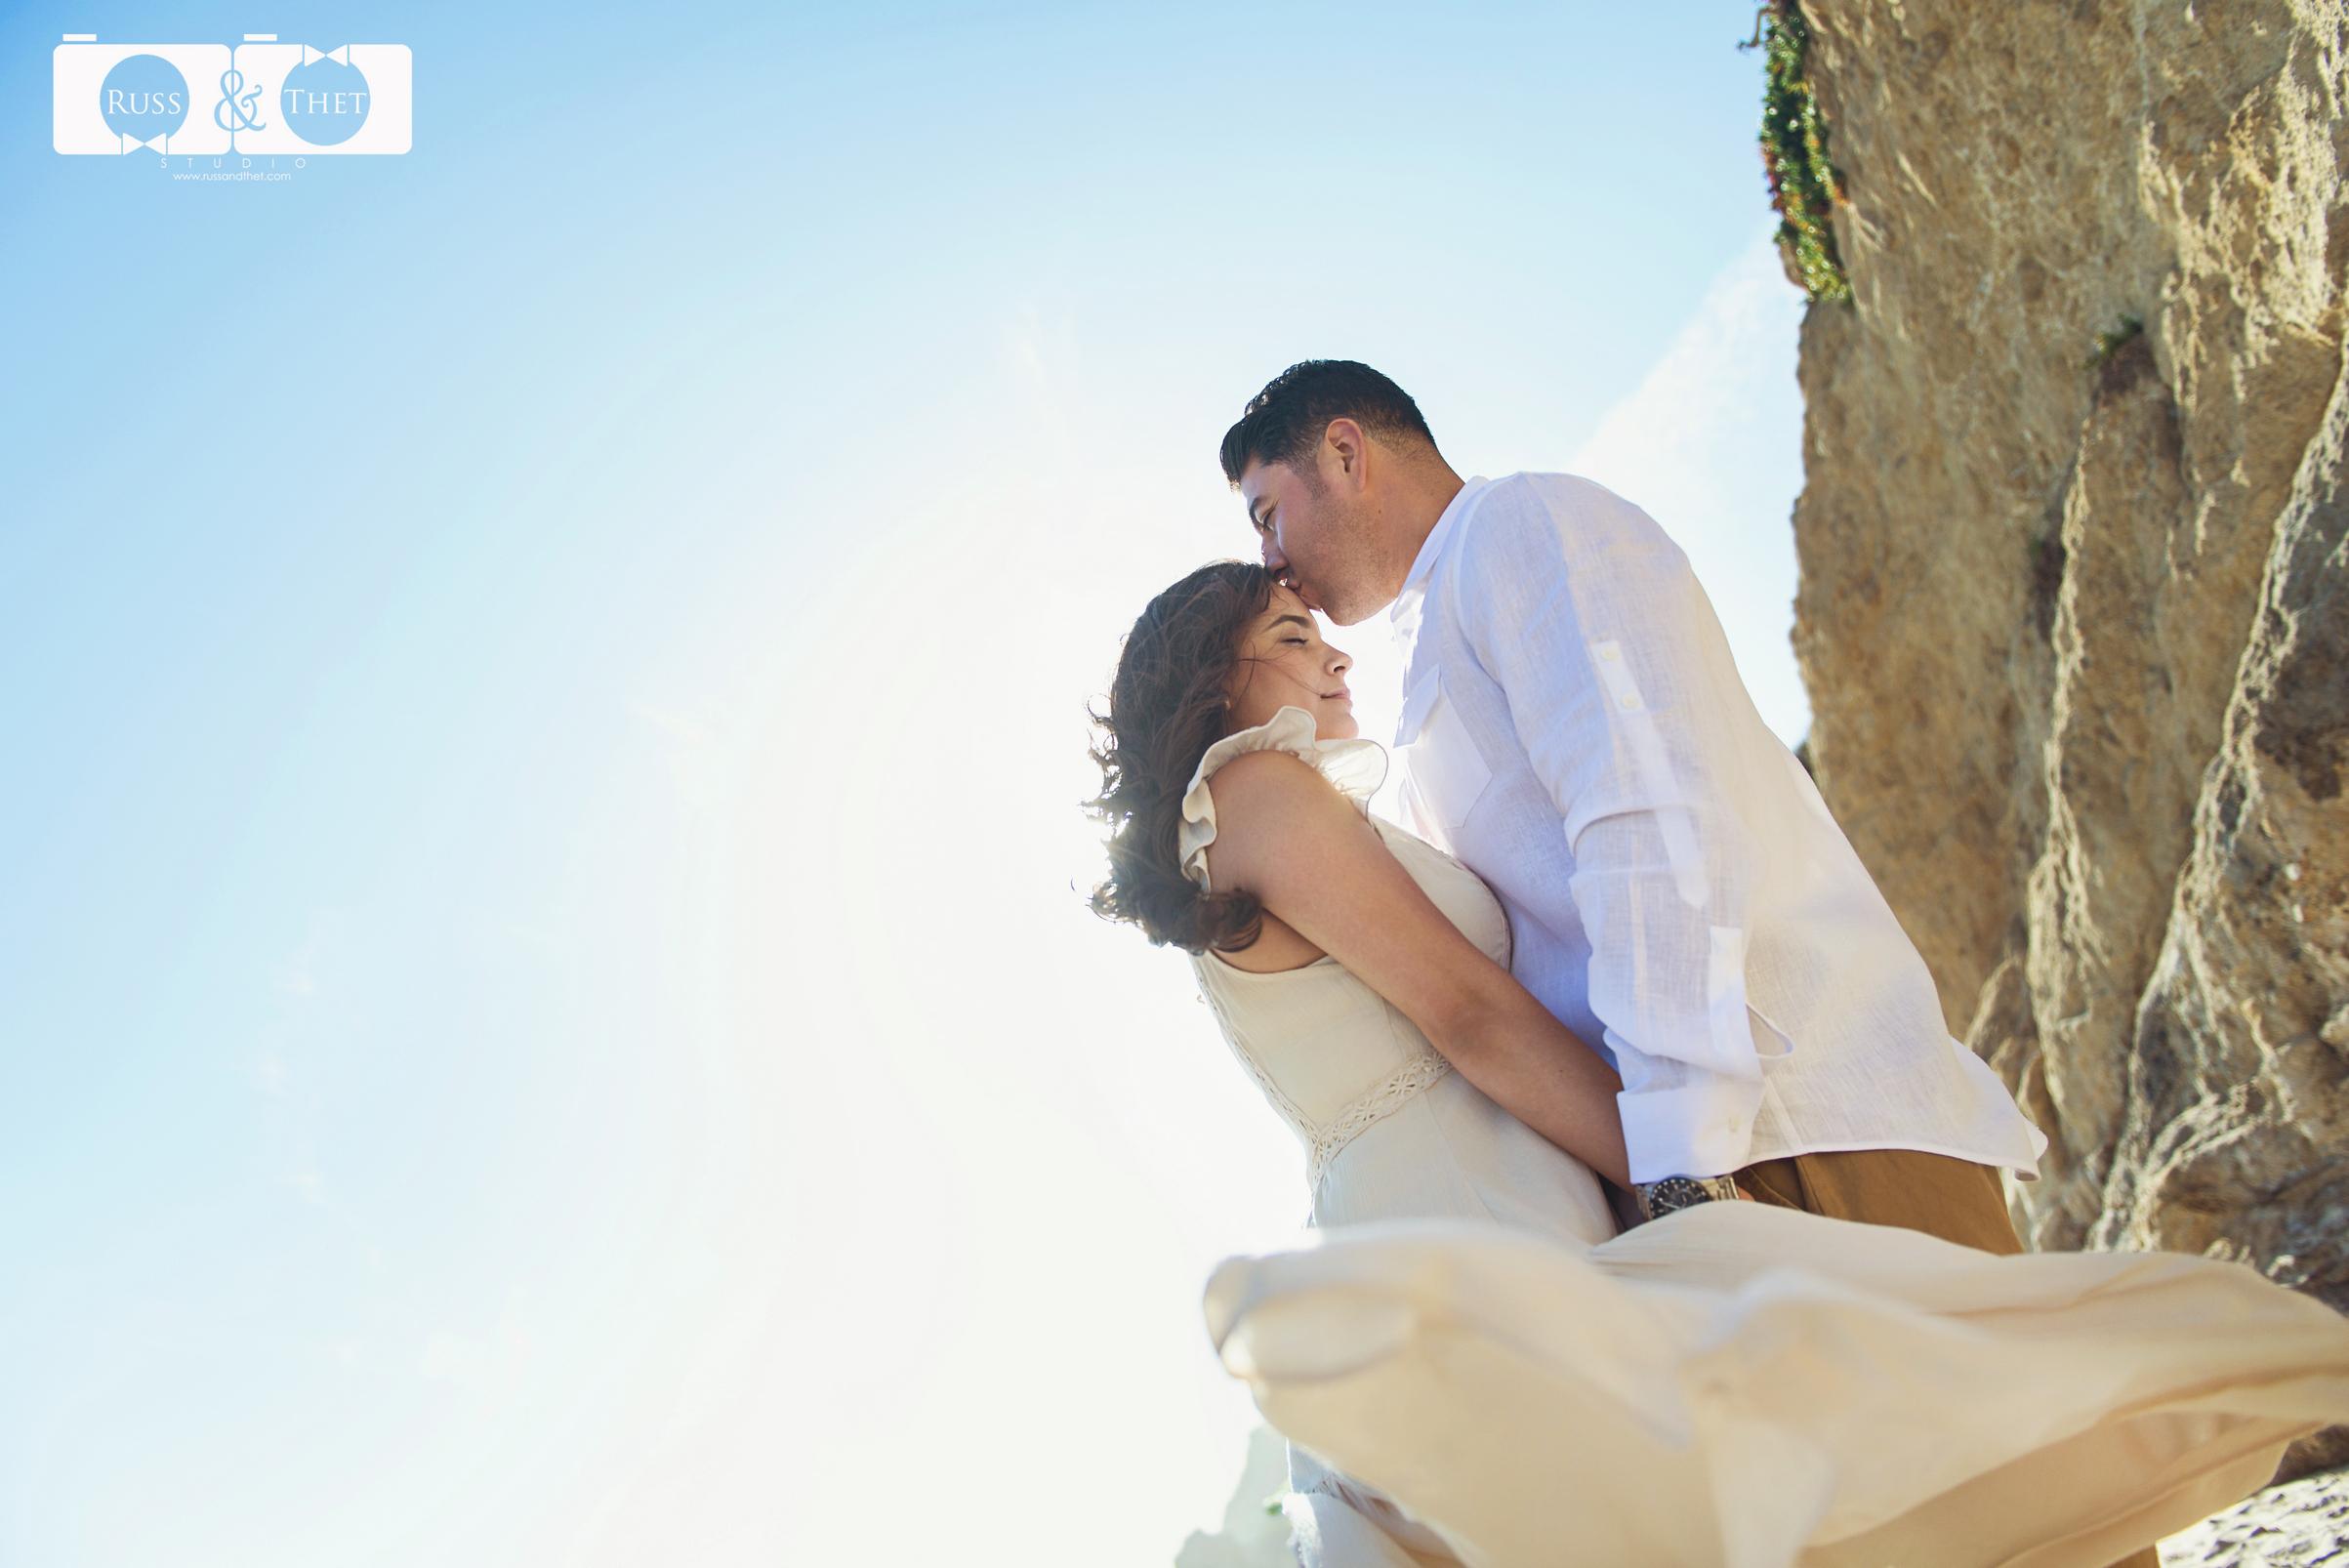 El-Matador-State-Beach-Malibu-Engagement-Photographer_ (2).jpg